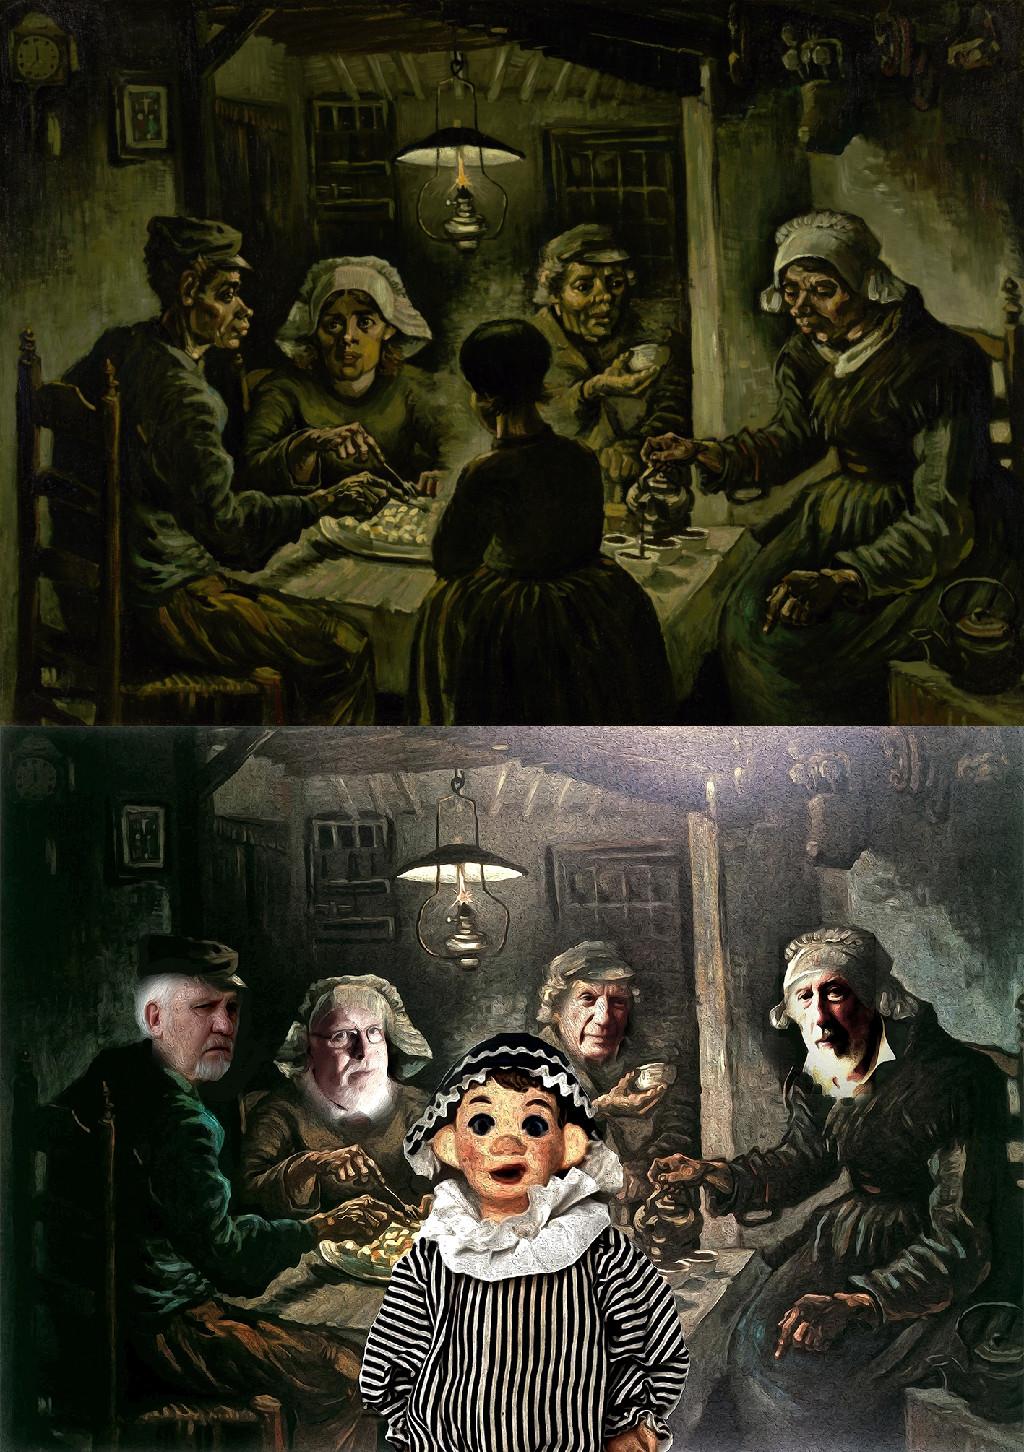 The Potato Eaters, Vincent van Gogh (1853-1890) vanGo'd by Gordon Coldwell